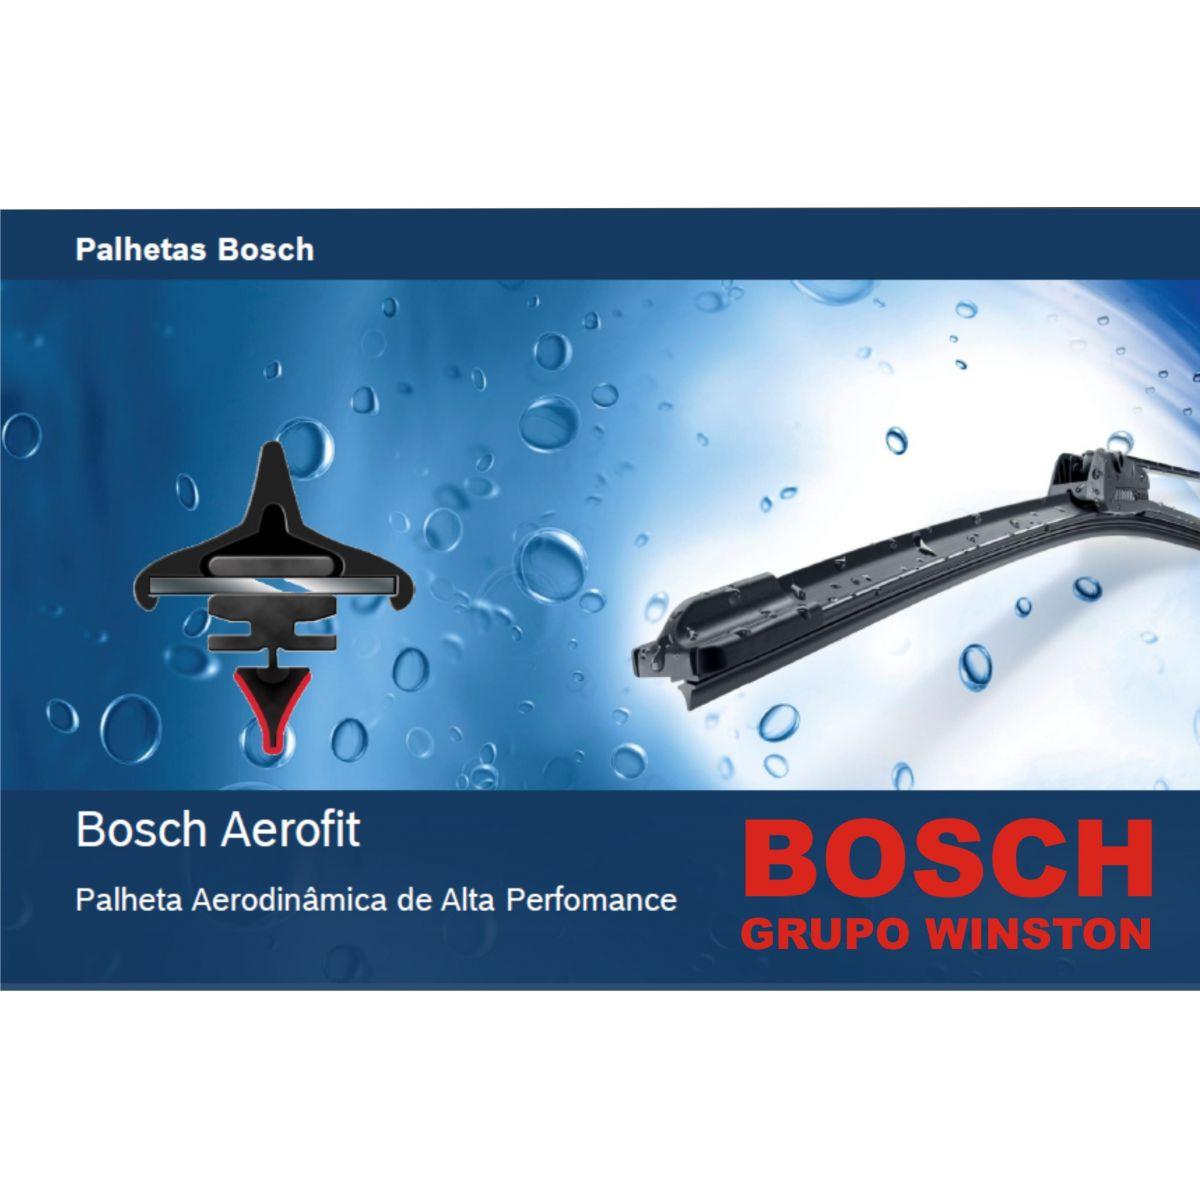 Palheta Bosch Aerofit Limpador de para brisa Bosch NISSAN Primera Sentra I